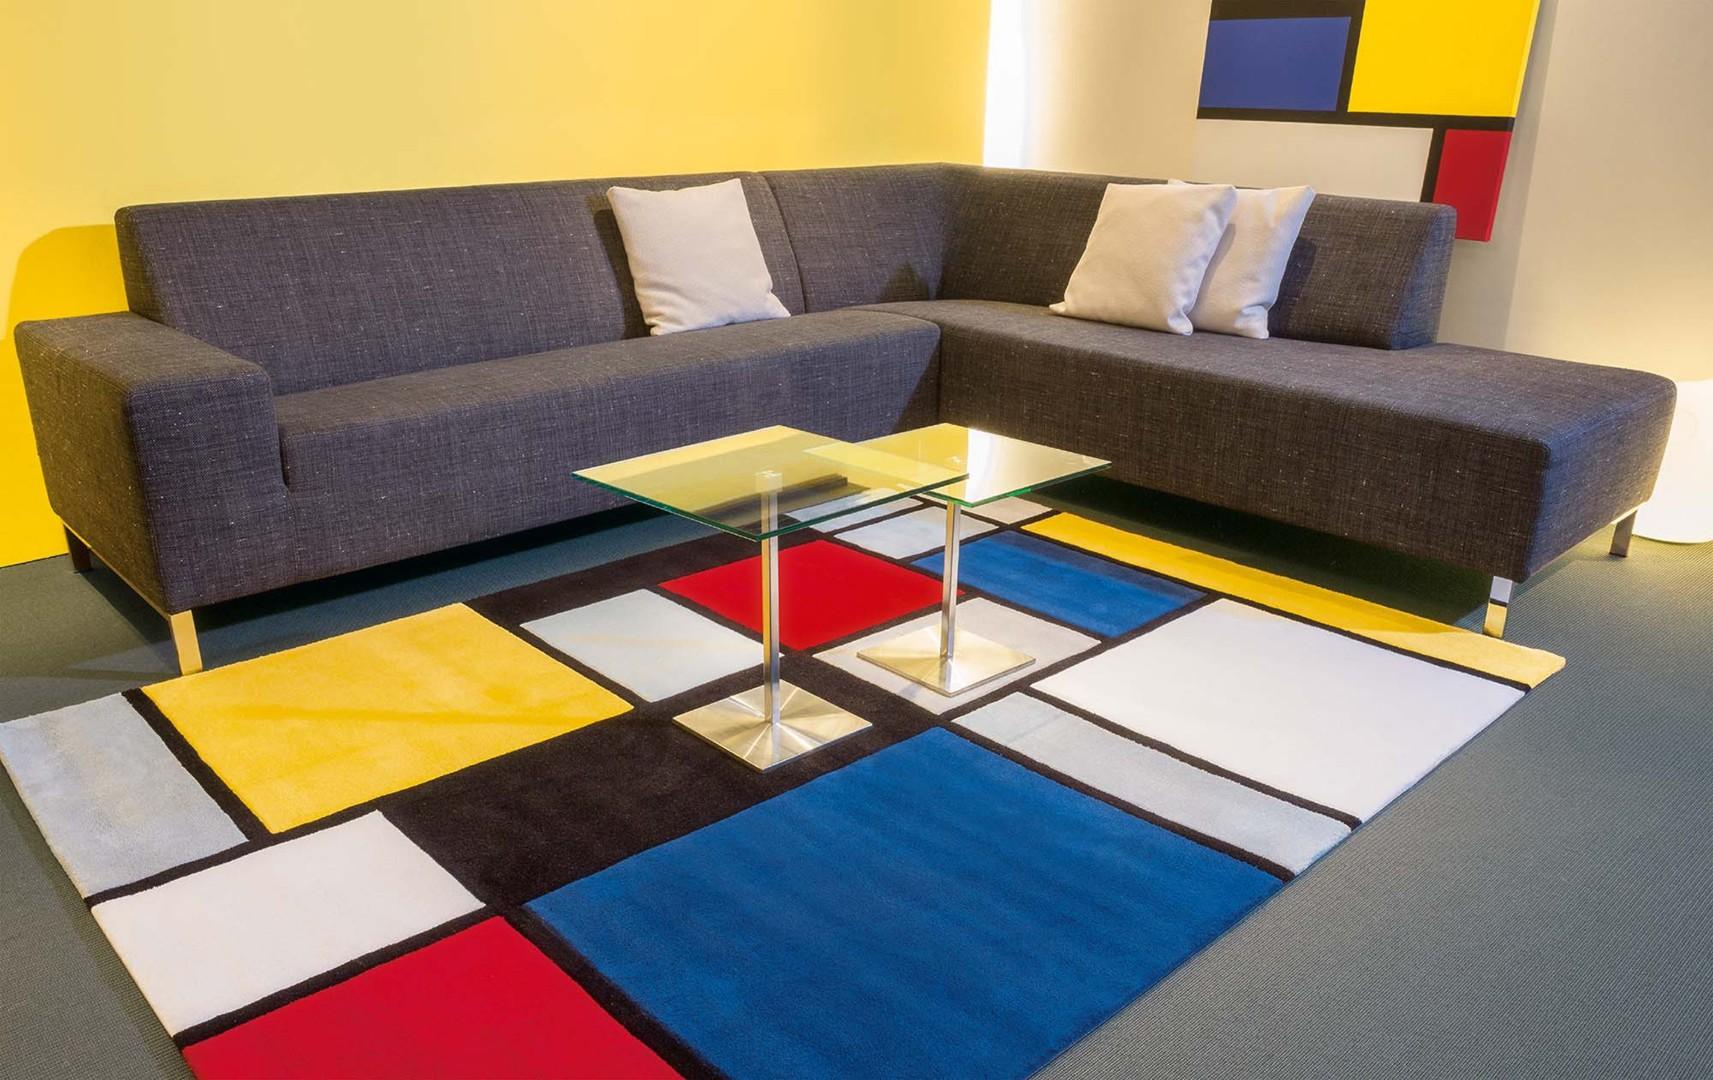 Tapis rectangle coloured cubes par arte espina - Tapis style mondrian ...